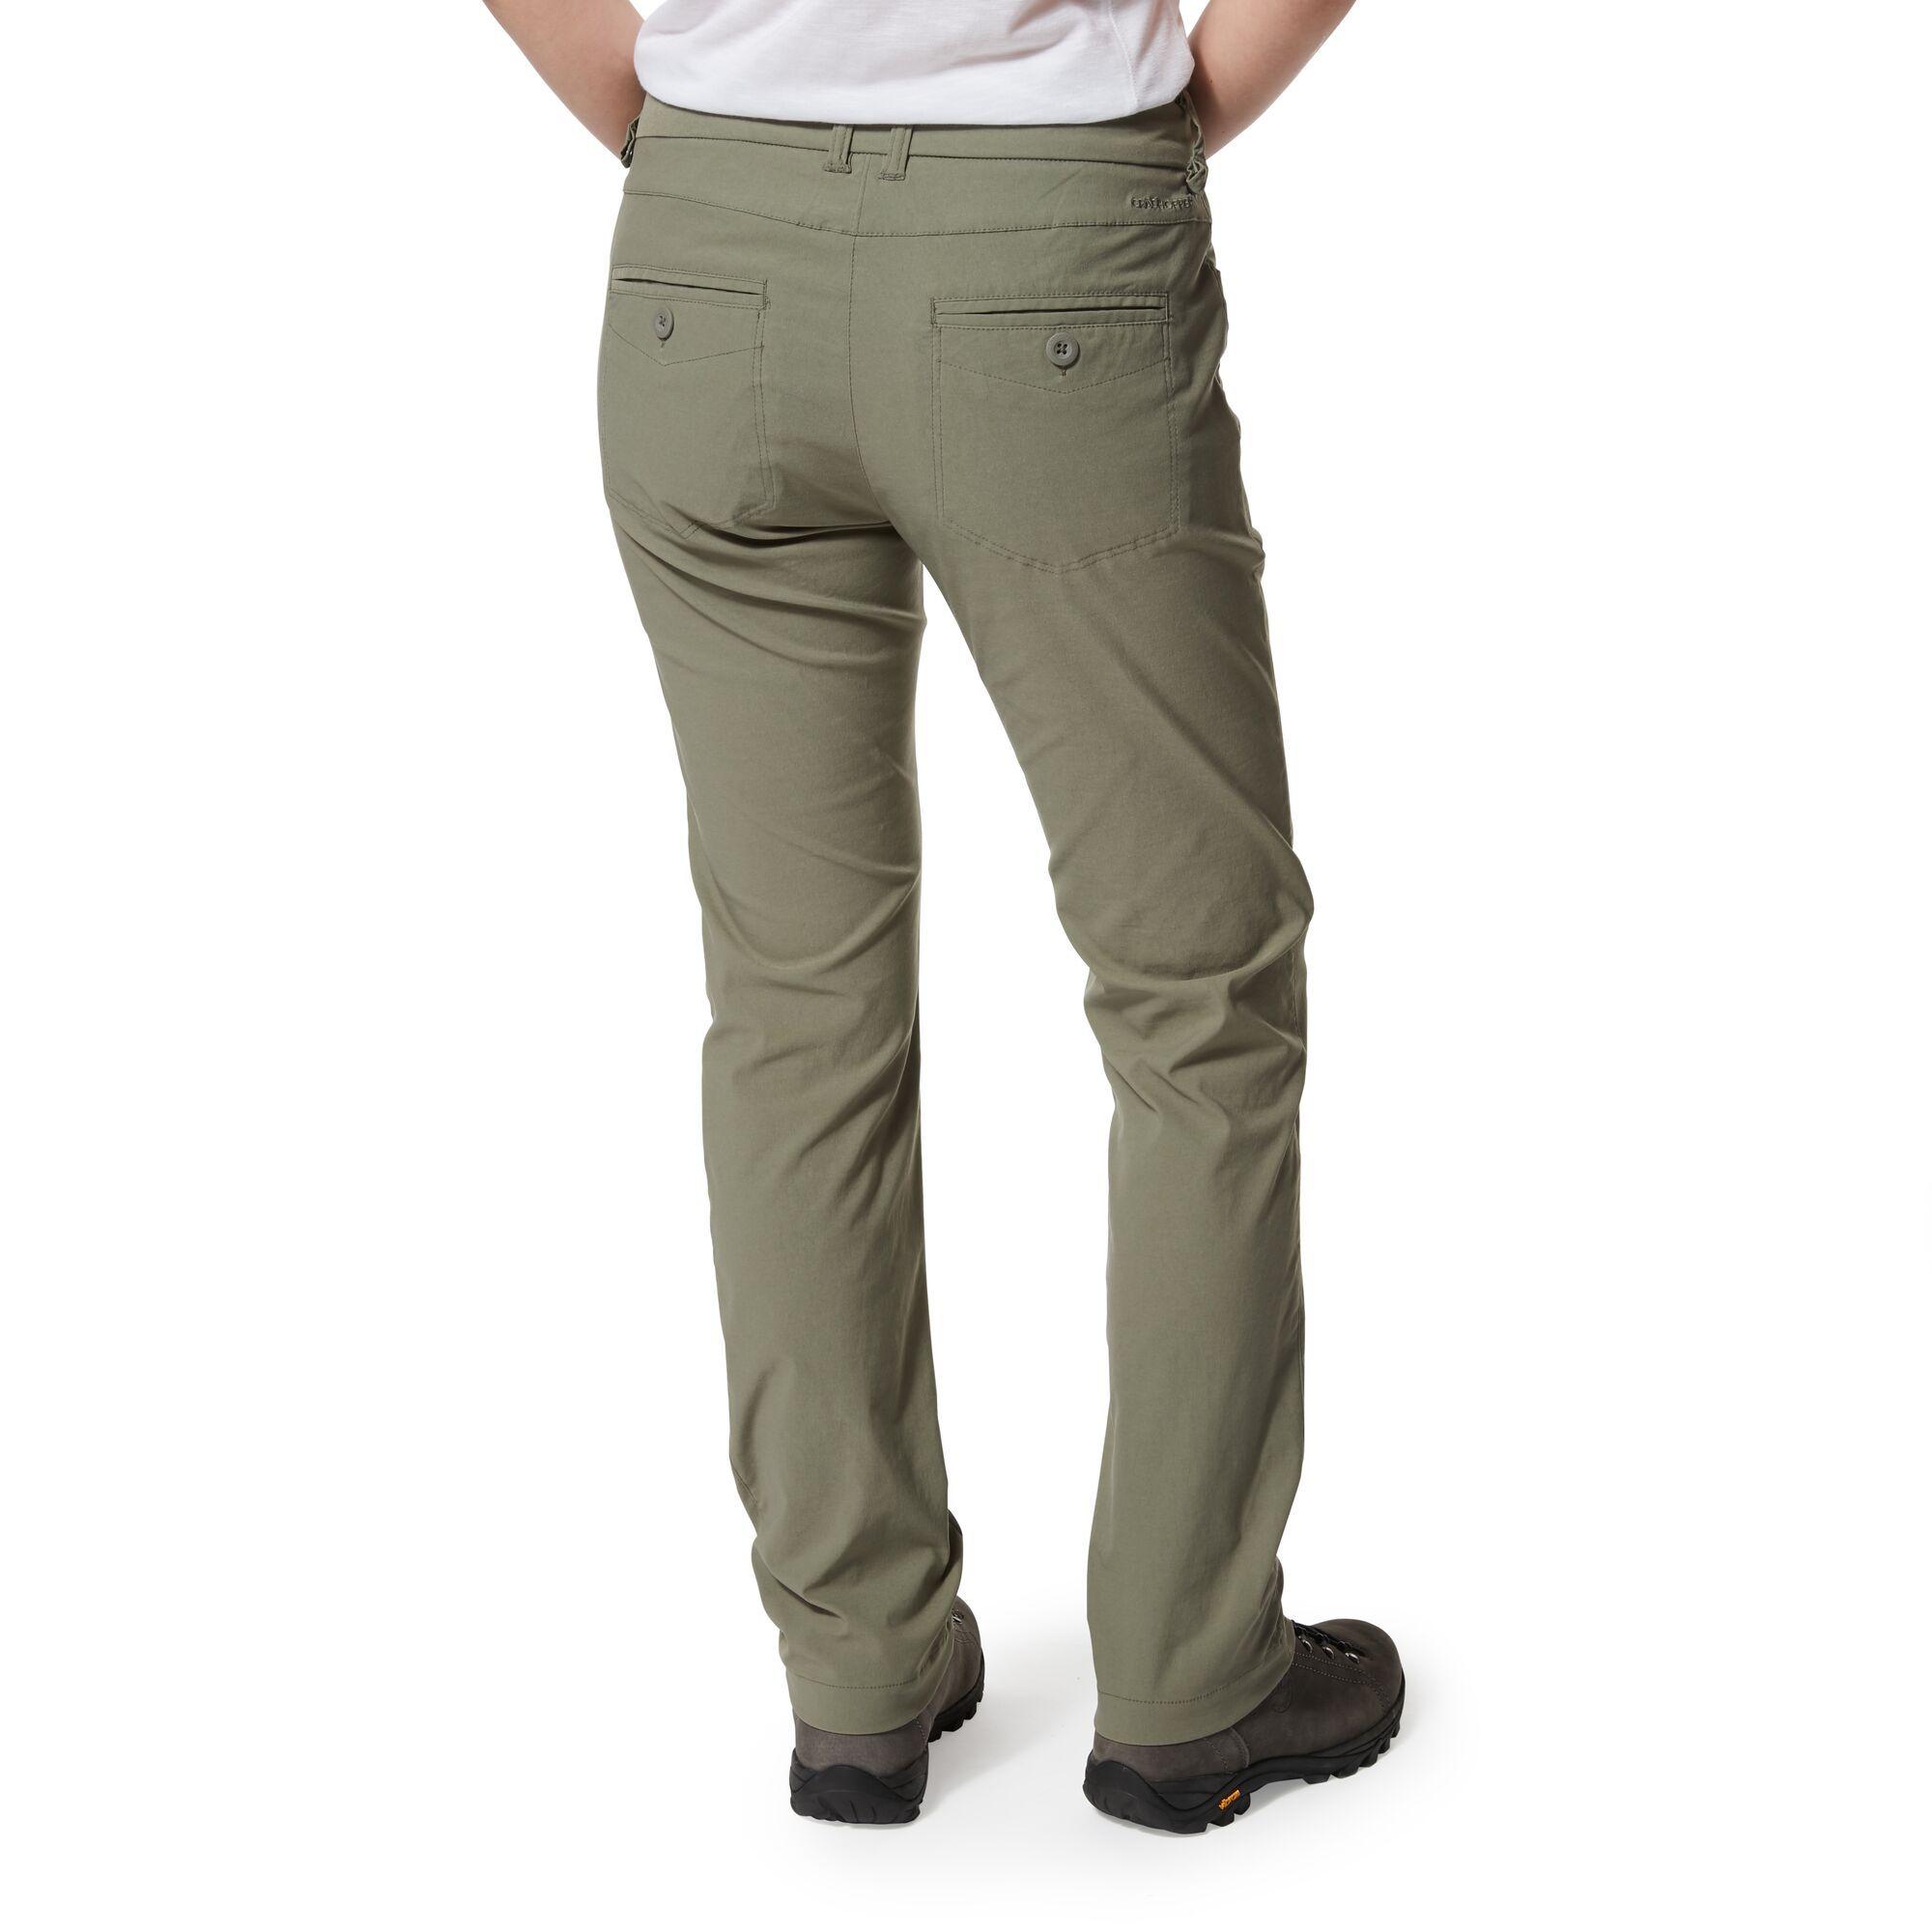 Craghoppers Womens Nosi Life Clara Stretch Walking Trousers